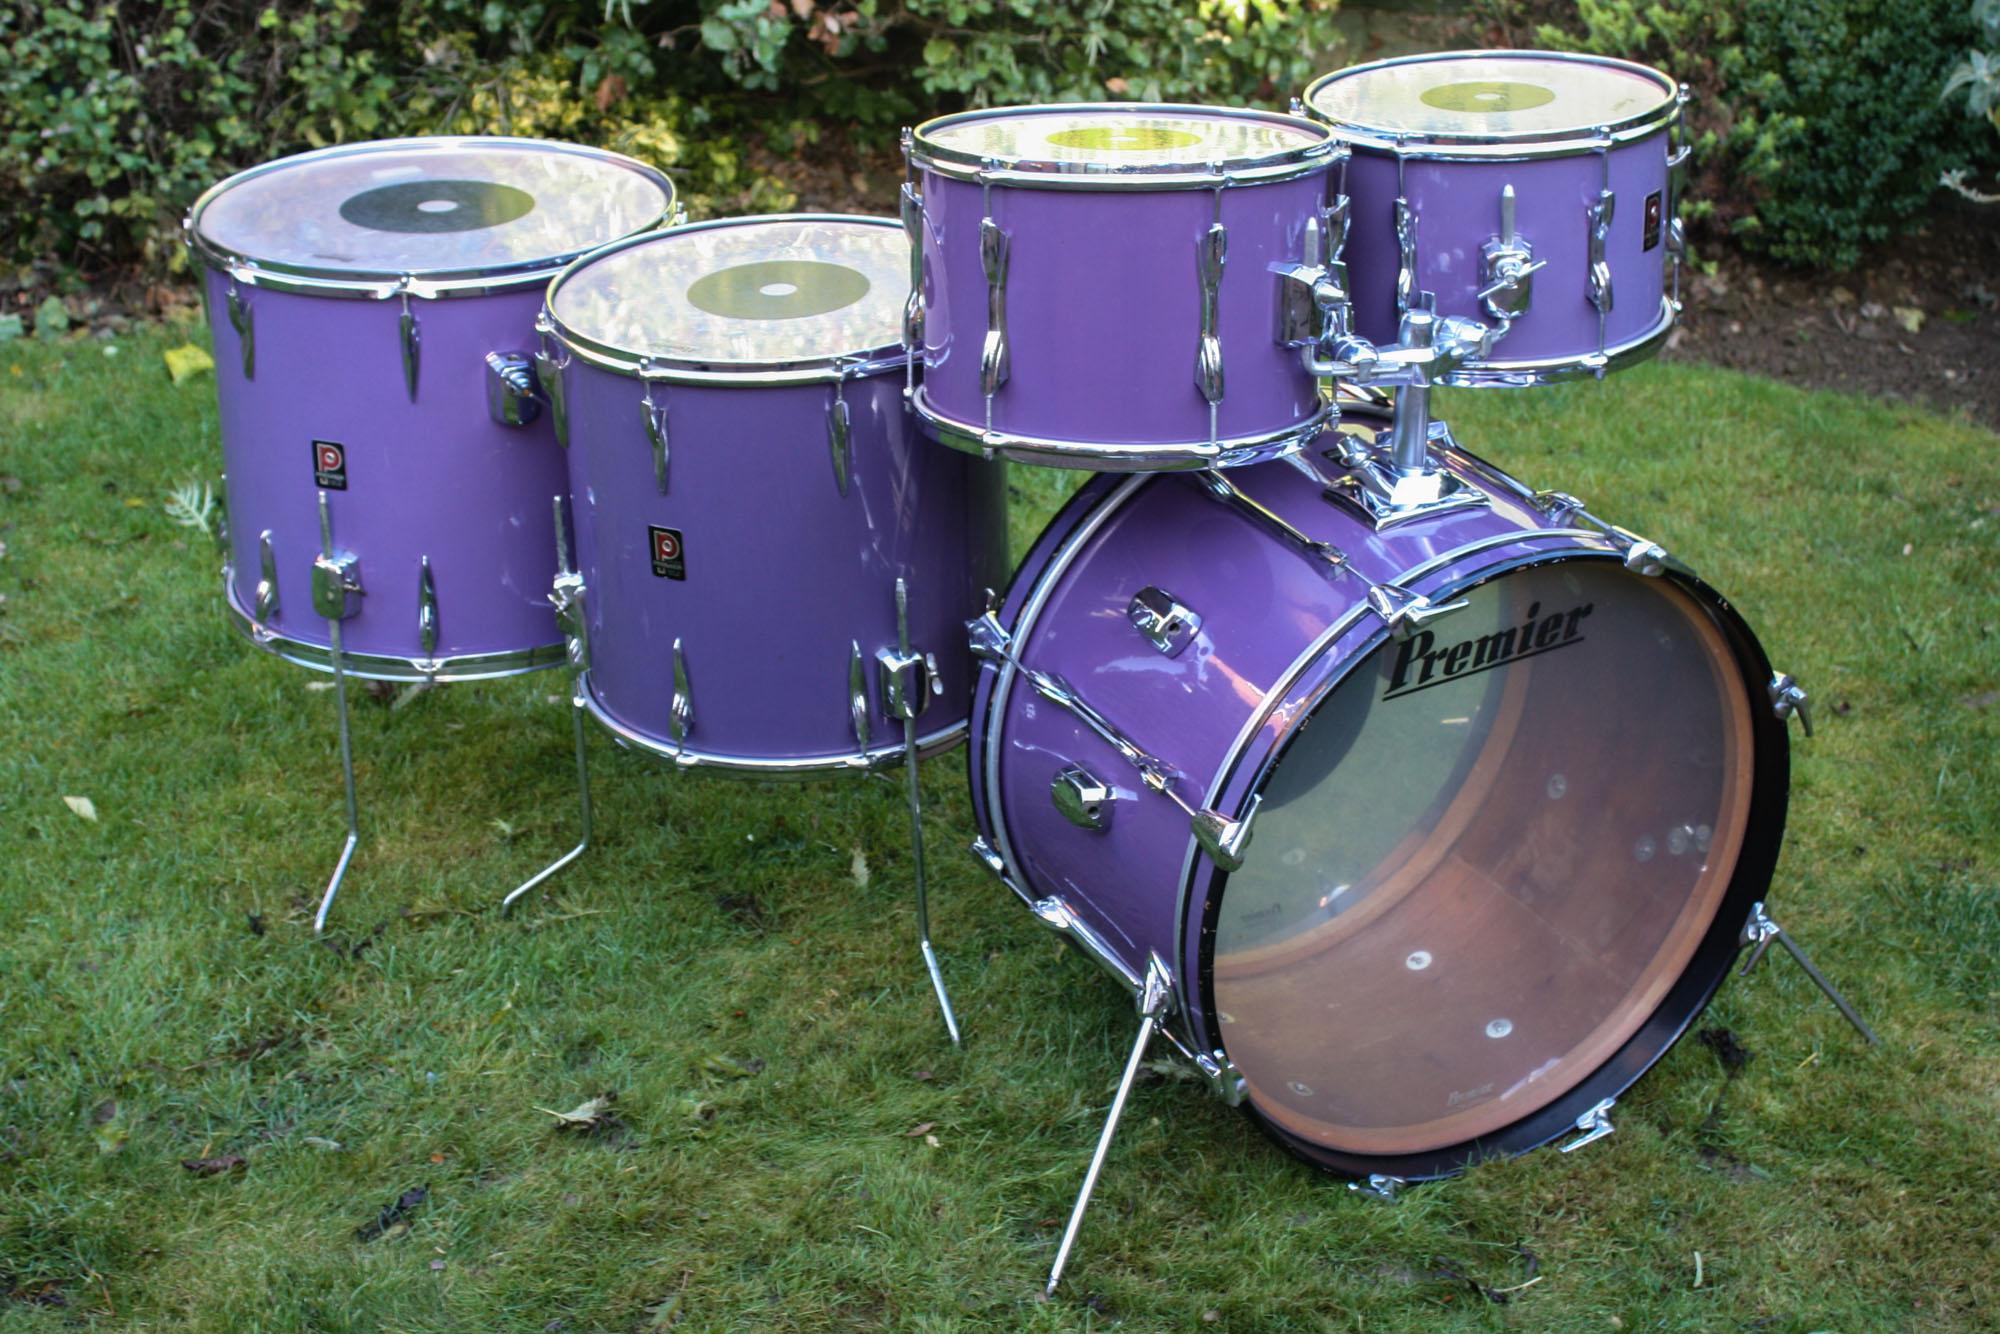 vintage 1970s premier drum kit in polychromatic purple more drums. Black Bedroom Furniture Sets. Home Design Ideas